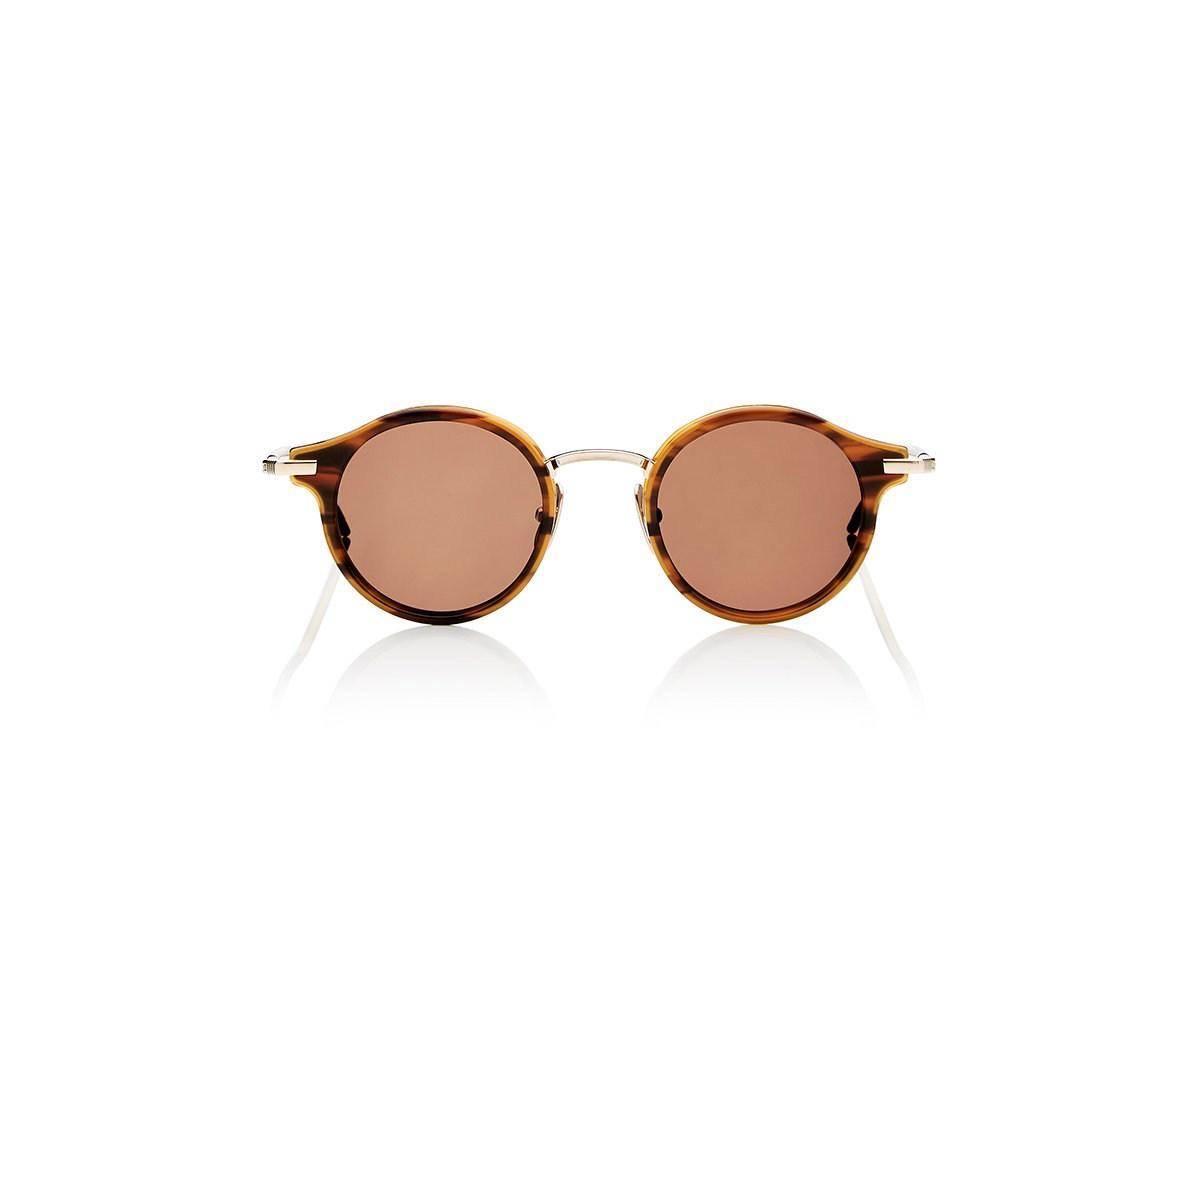 93e1fce0416 Lyst - Thom Browne Tb 807 Sunglasses in Brown for Men